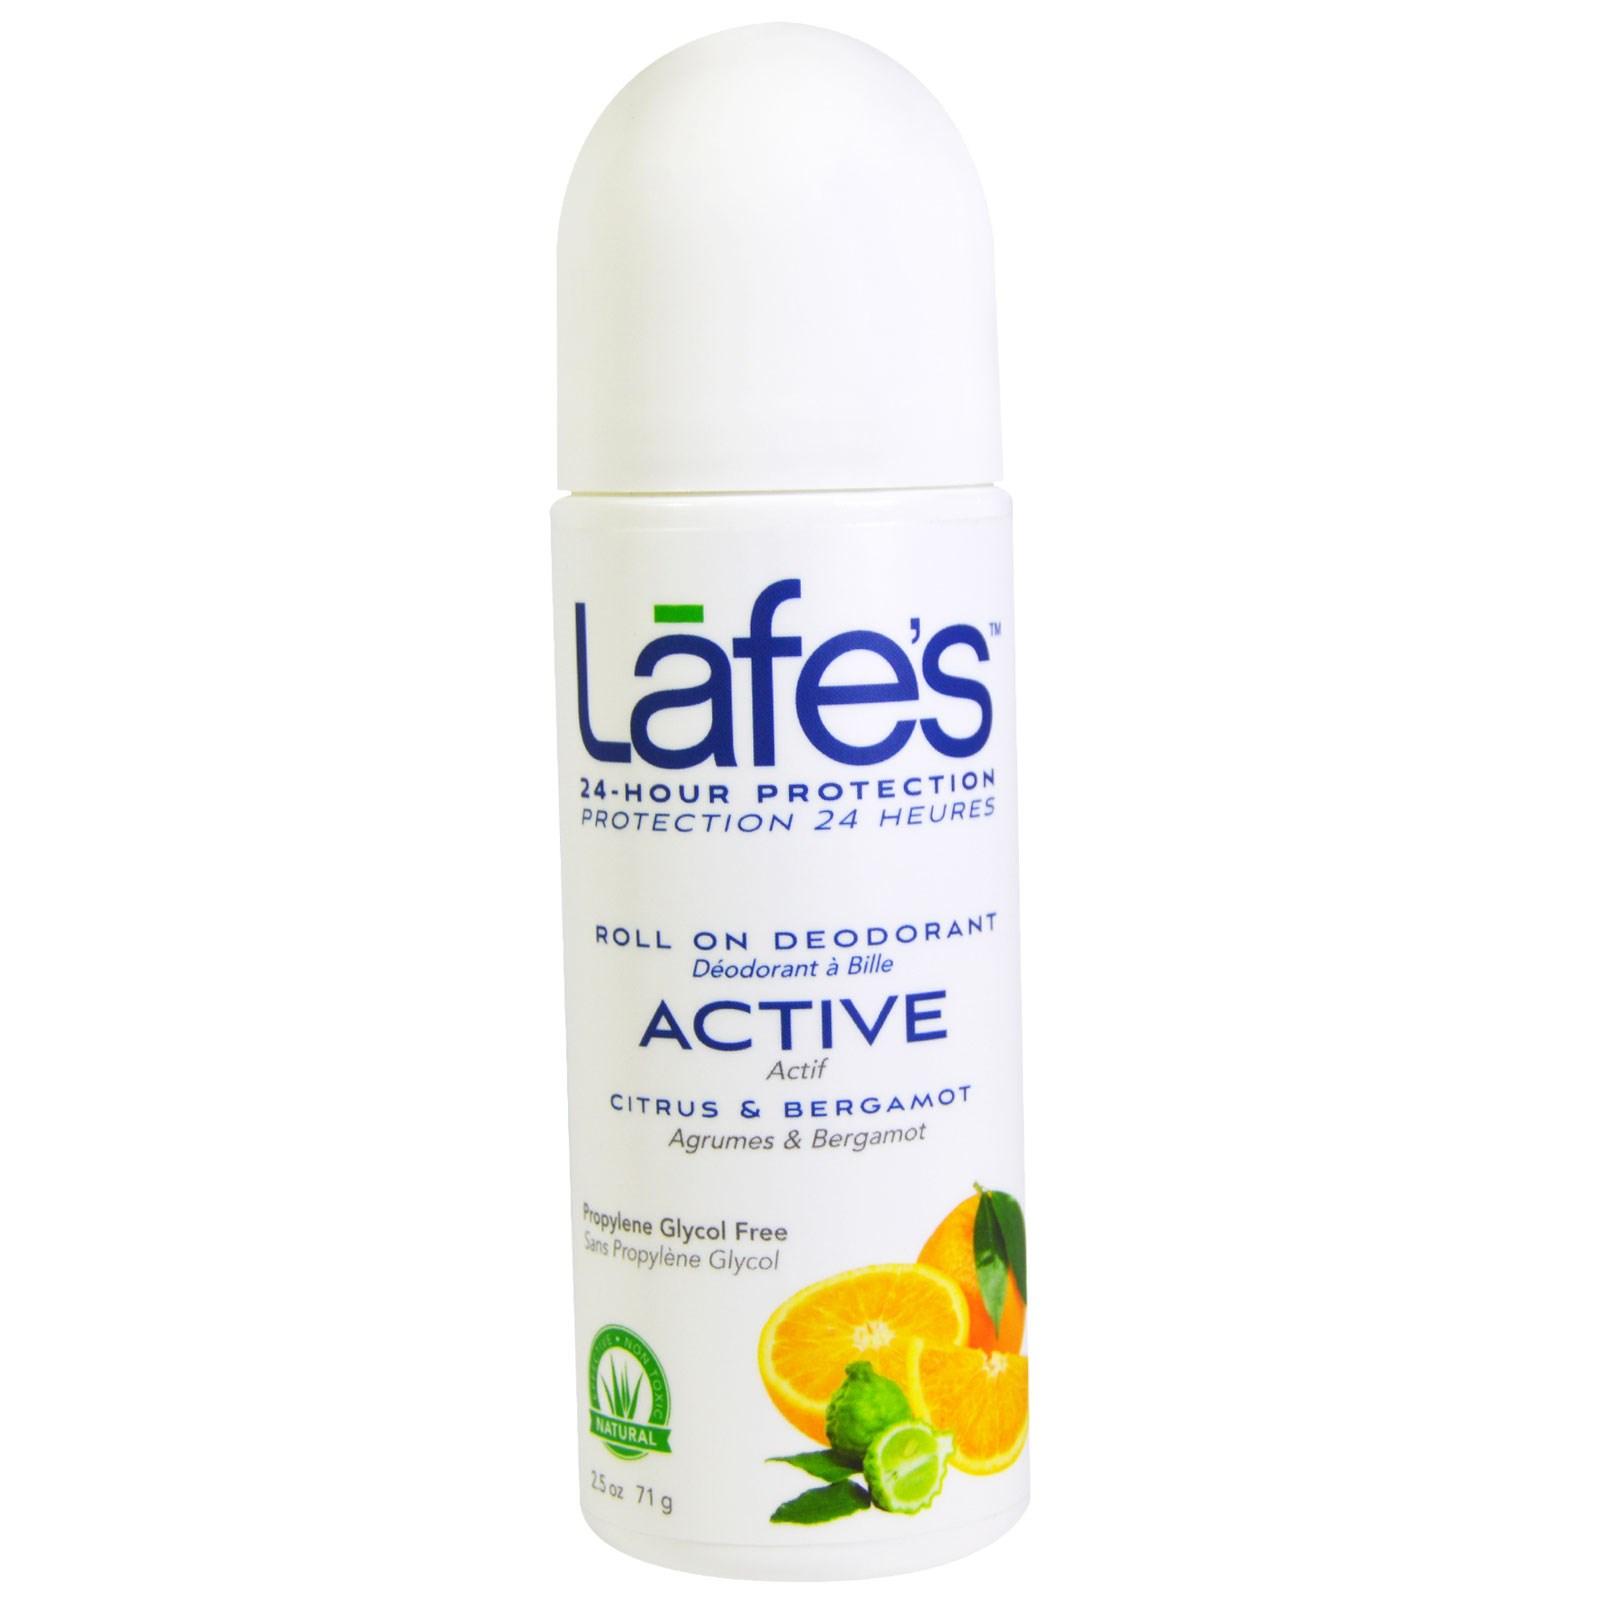 Lafe's Natural Body Care, Дезодорант-шарик, активность, цитрус и бергамот, 2,5 унции (71 г)